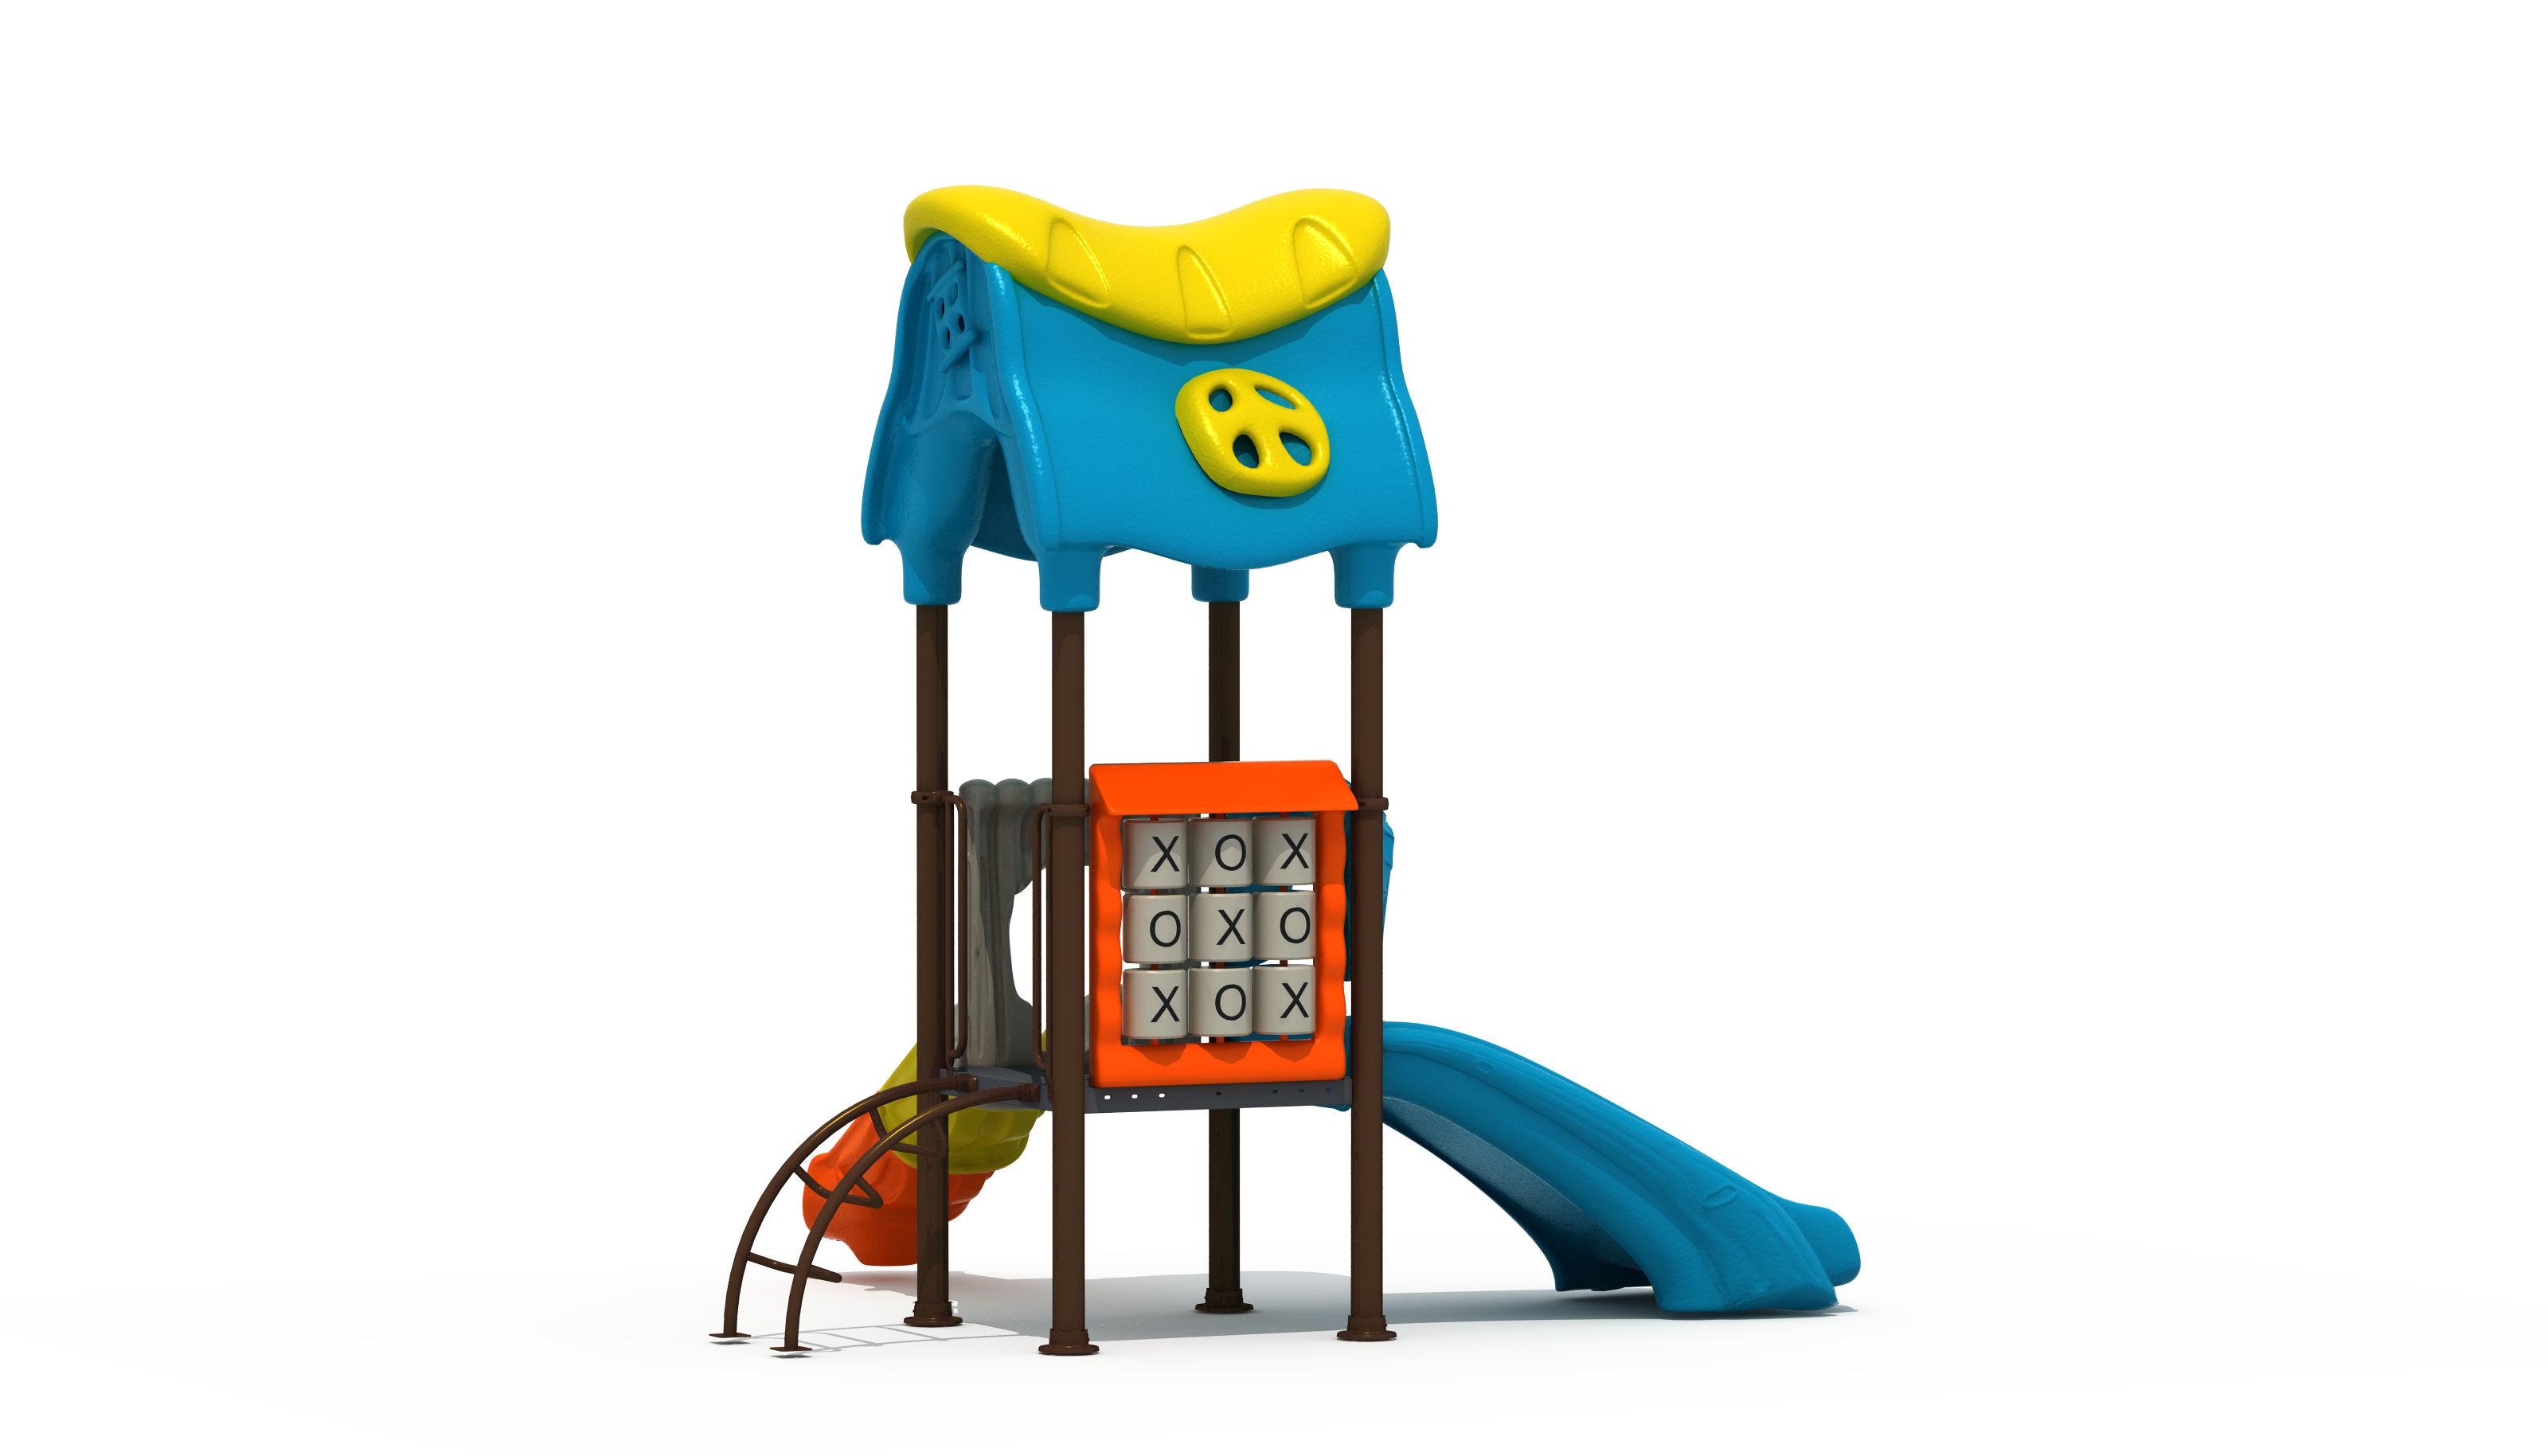 Torre de Juego Infantil para Exterior 3,9X3X3,4 m